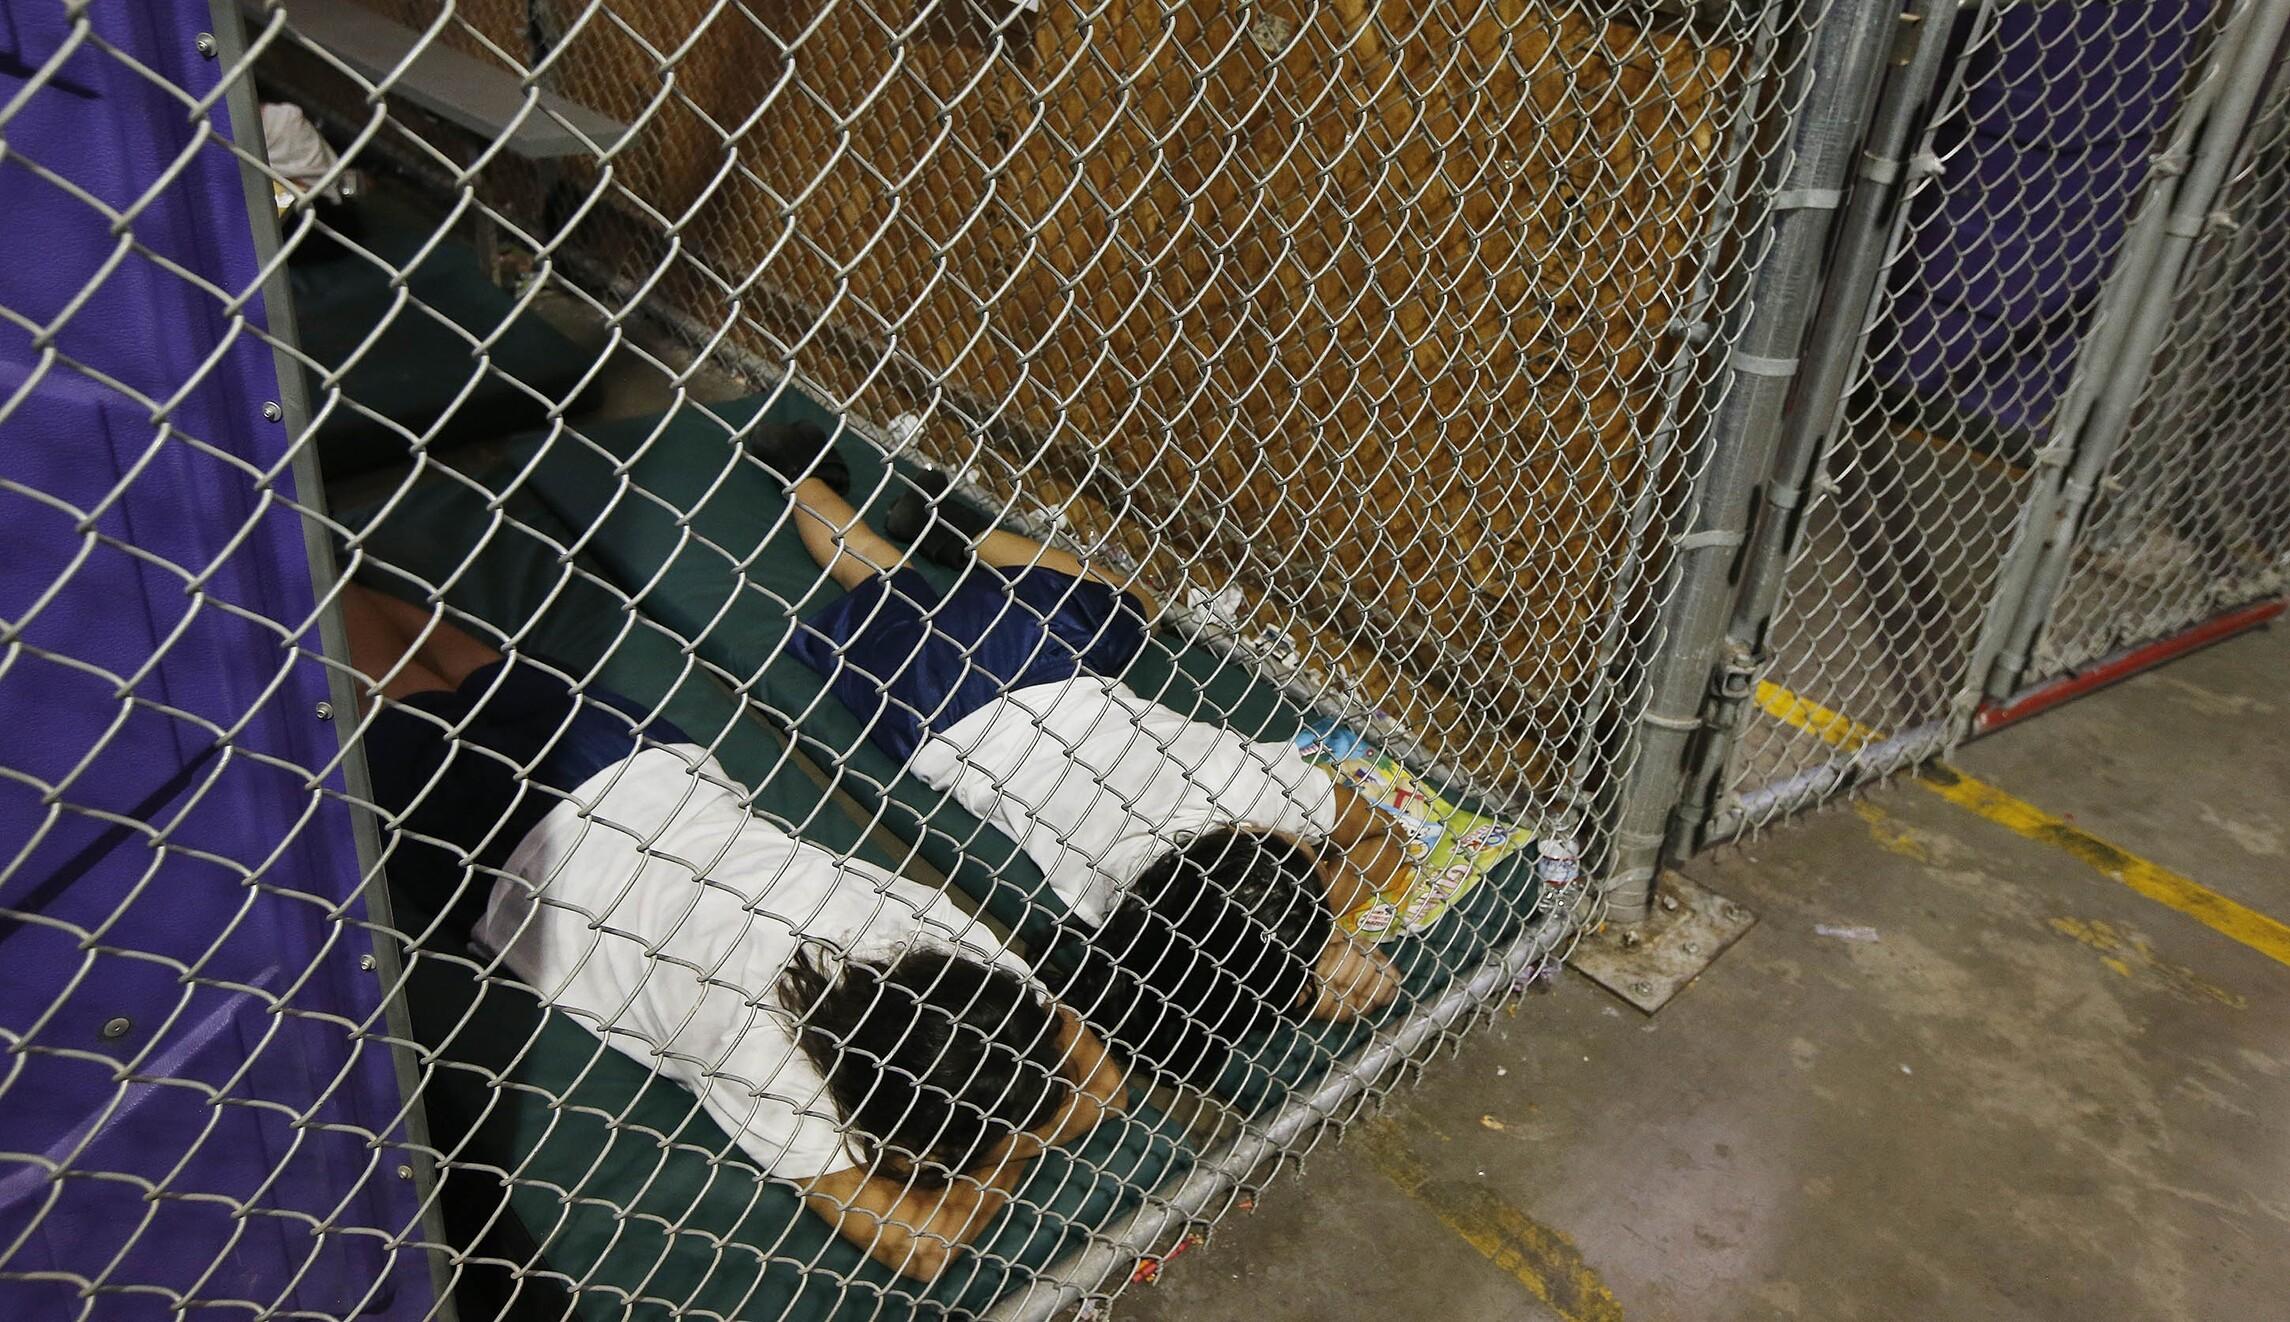 Immigration detention center children